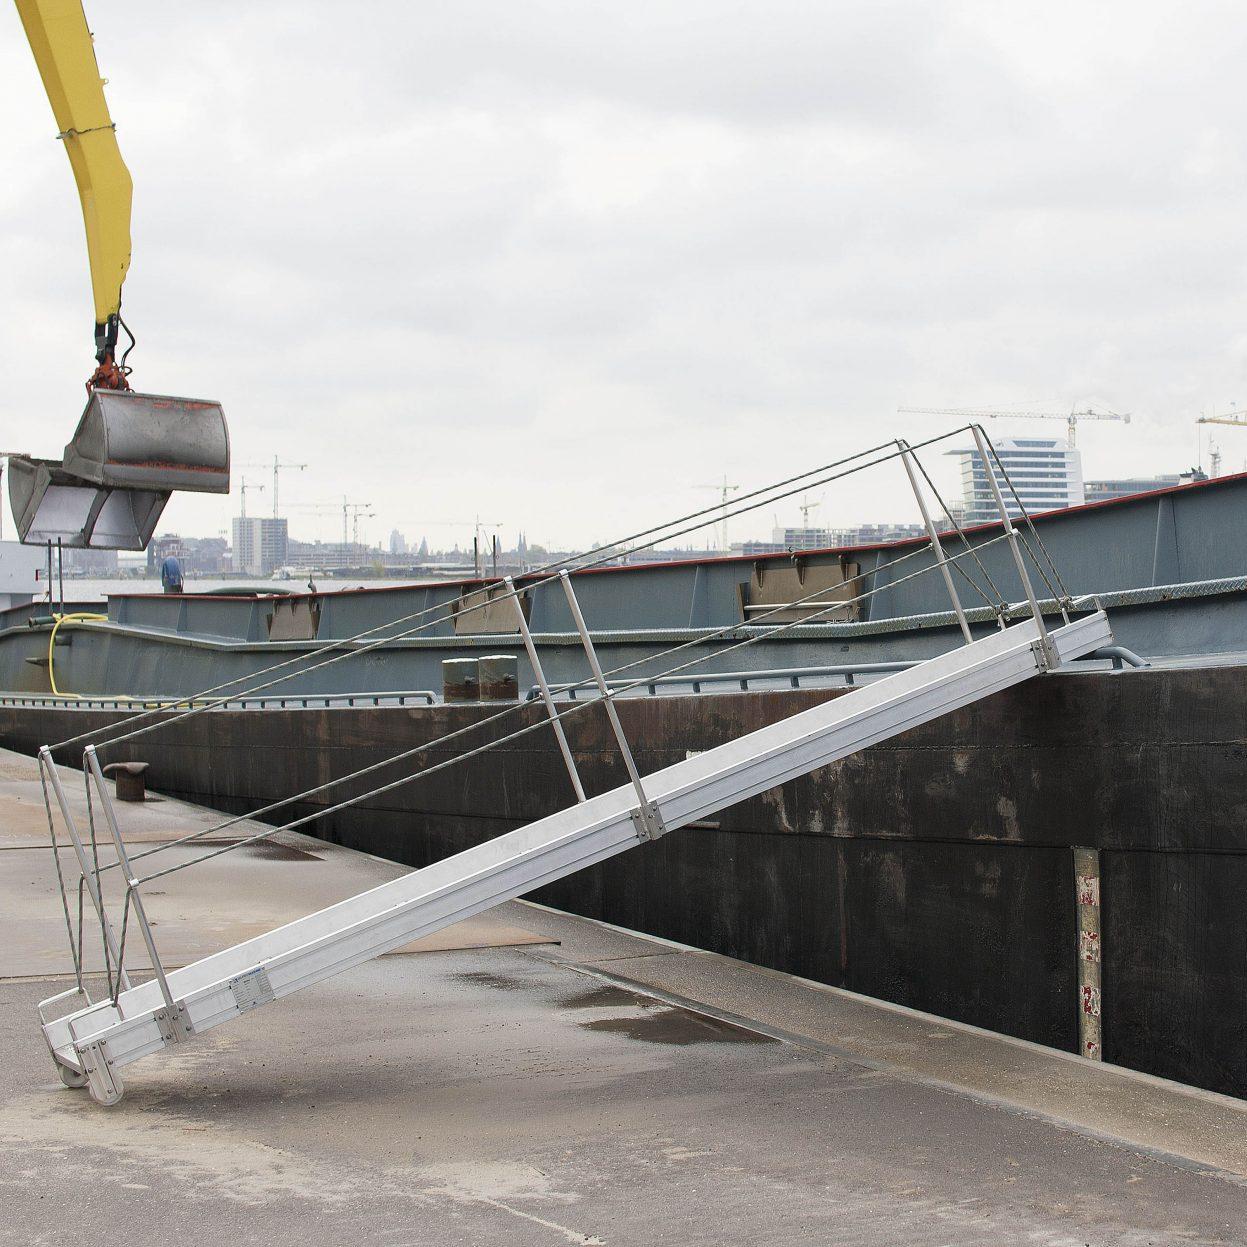 Products4Ships aluminium loopplanken binnenvaart